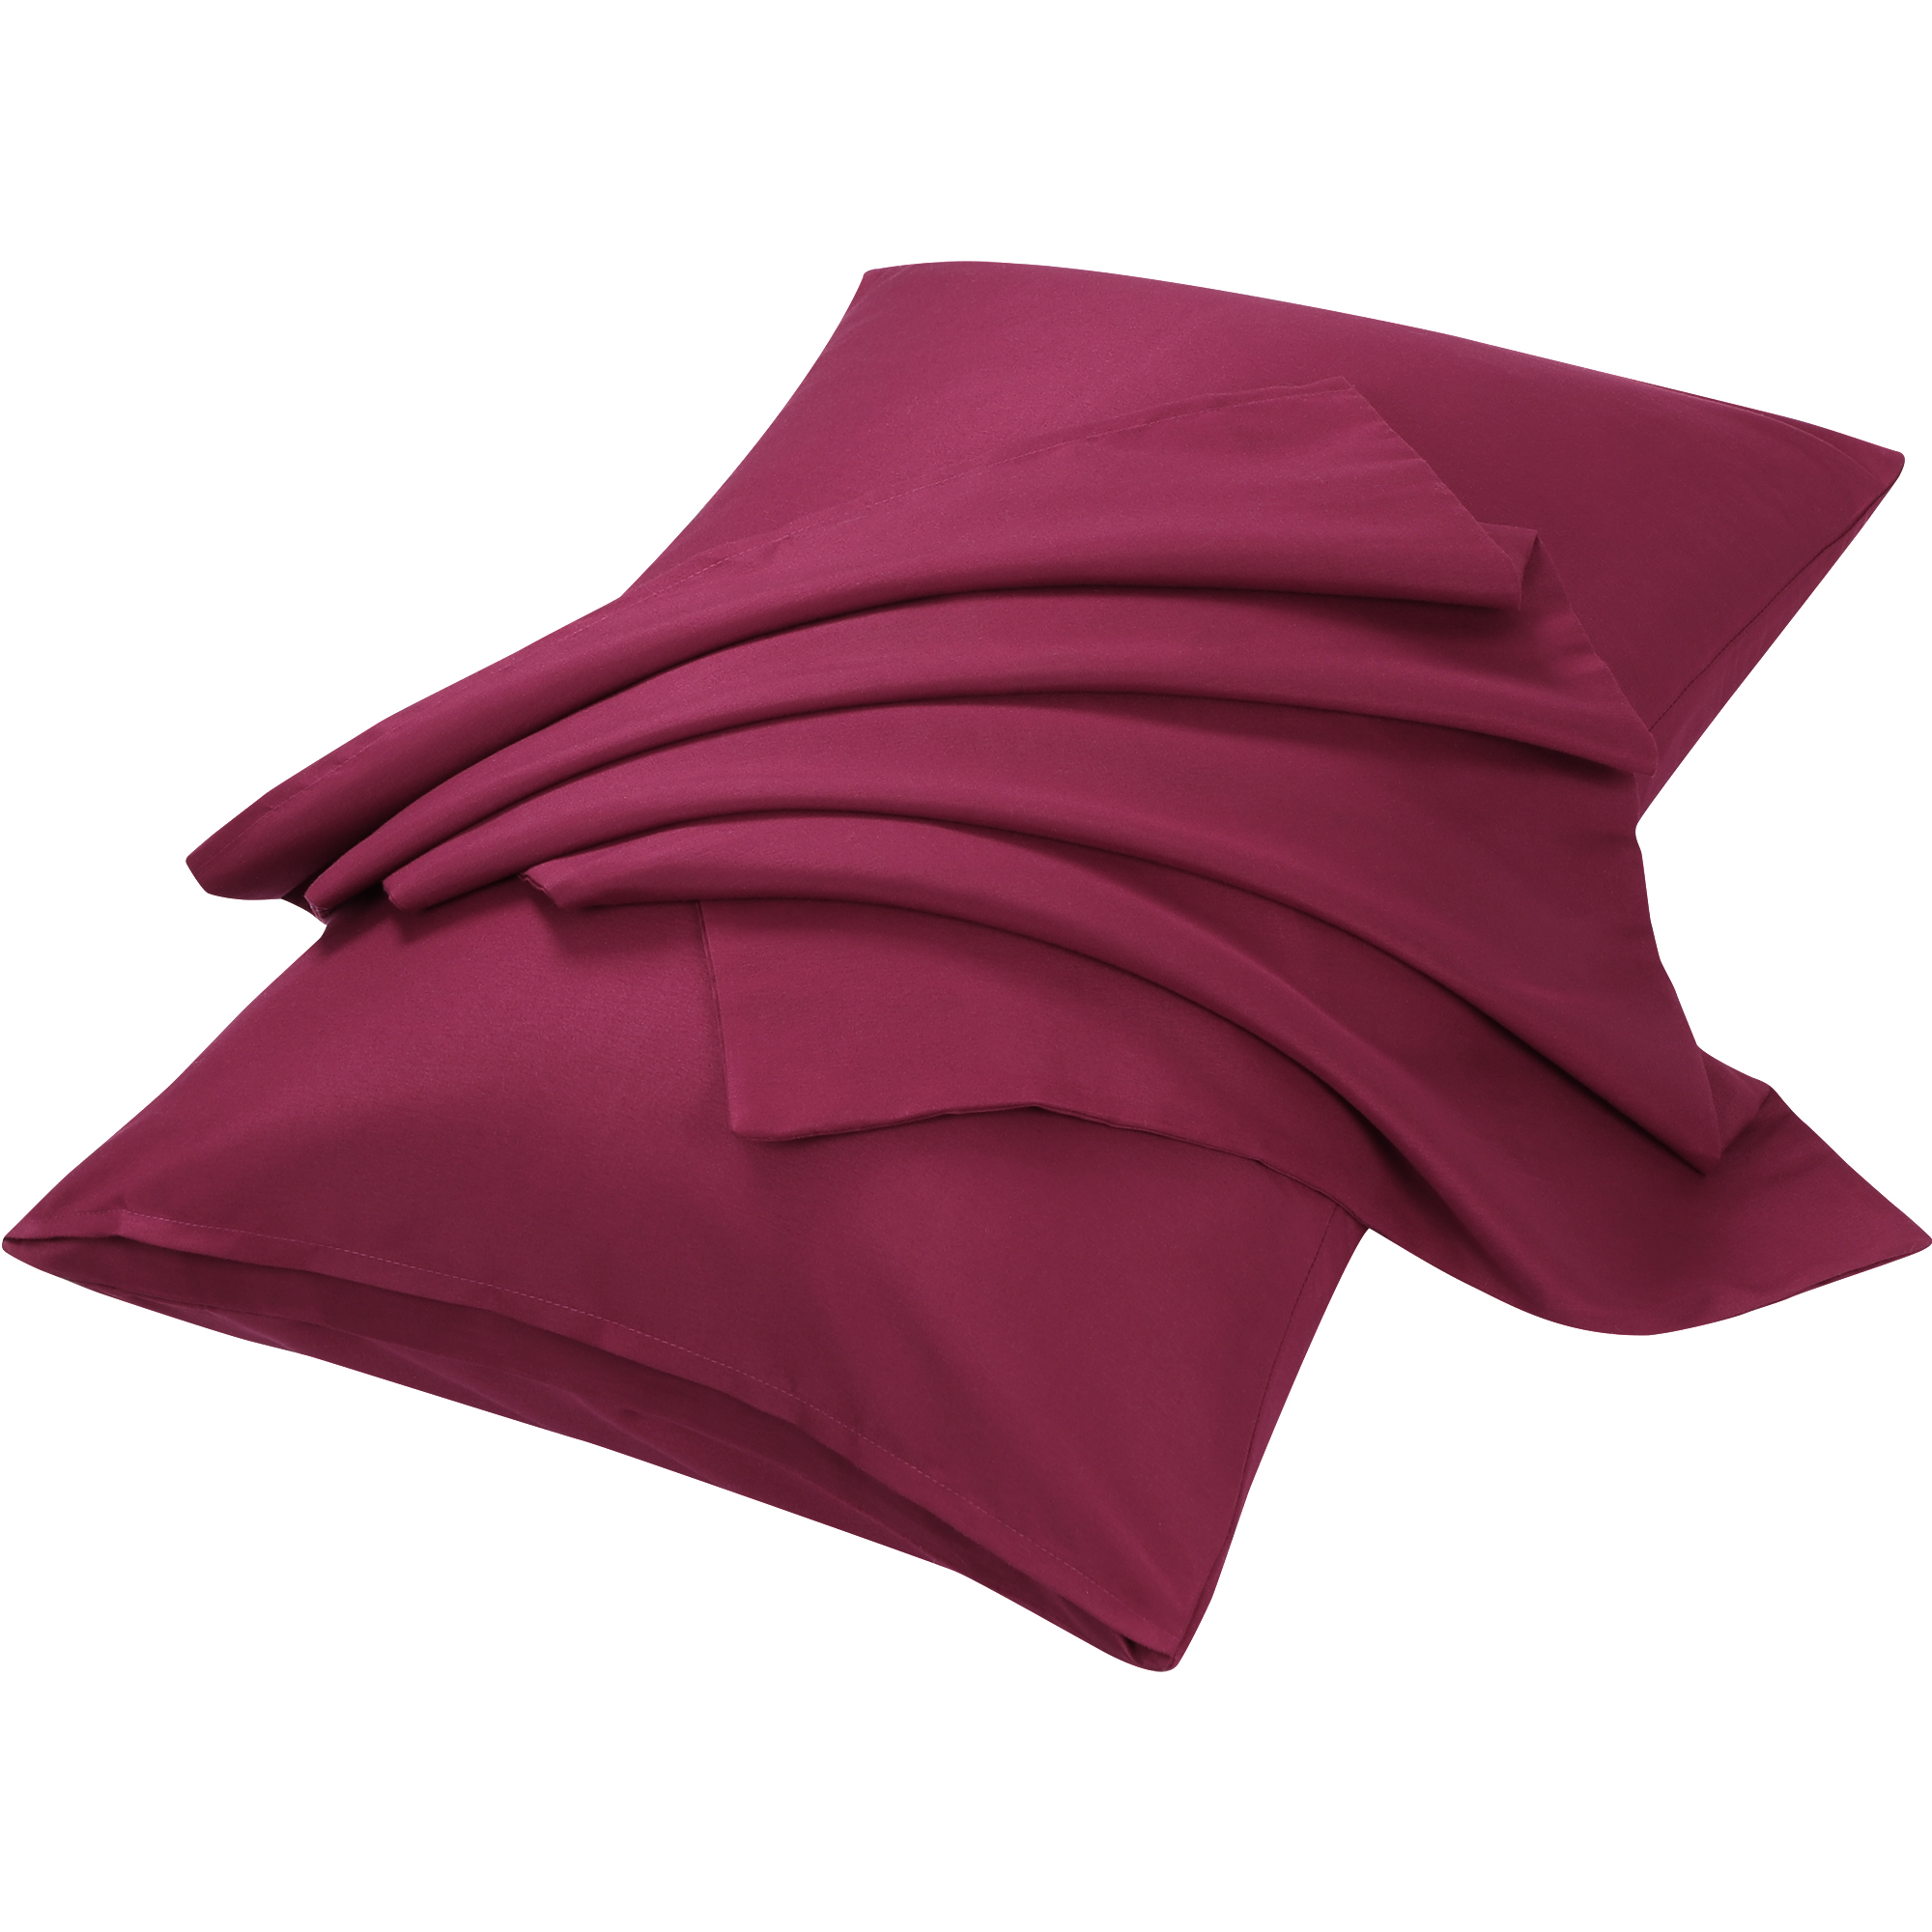 "2pcs Pillowcases Soft Microfiber, No Wrinkle, Wine Travel (14"" x 20"")"